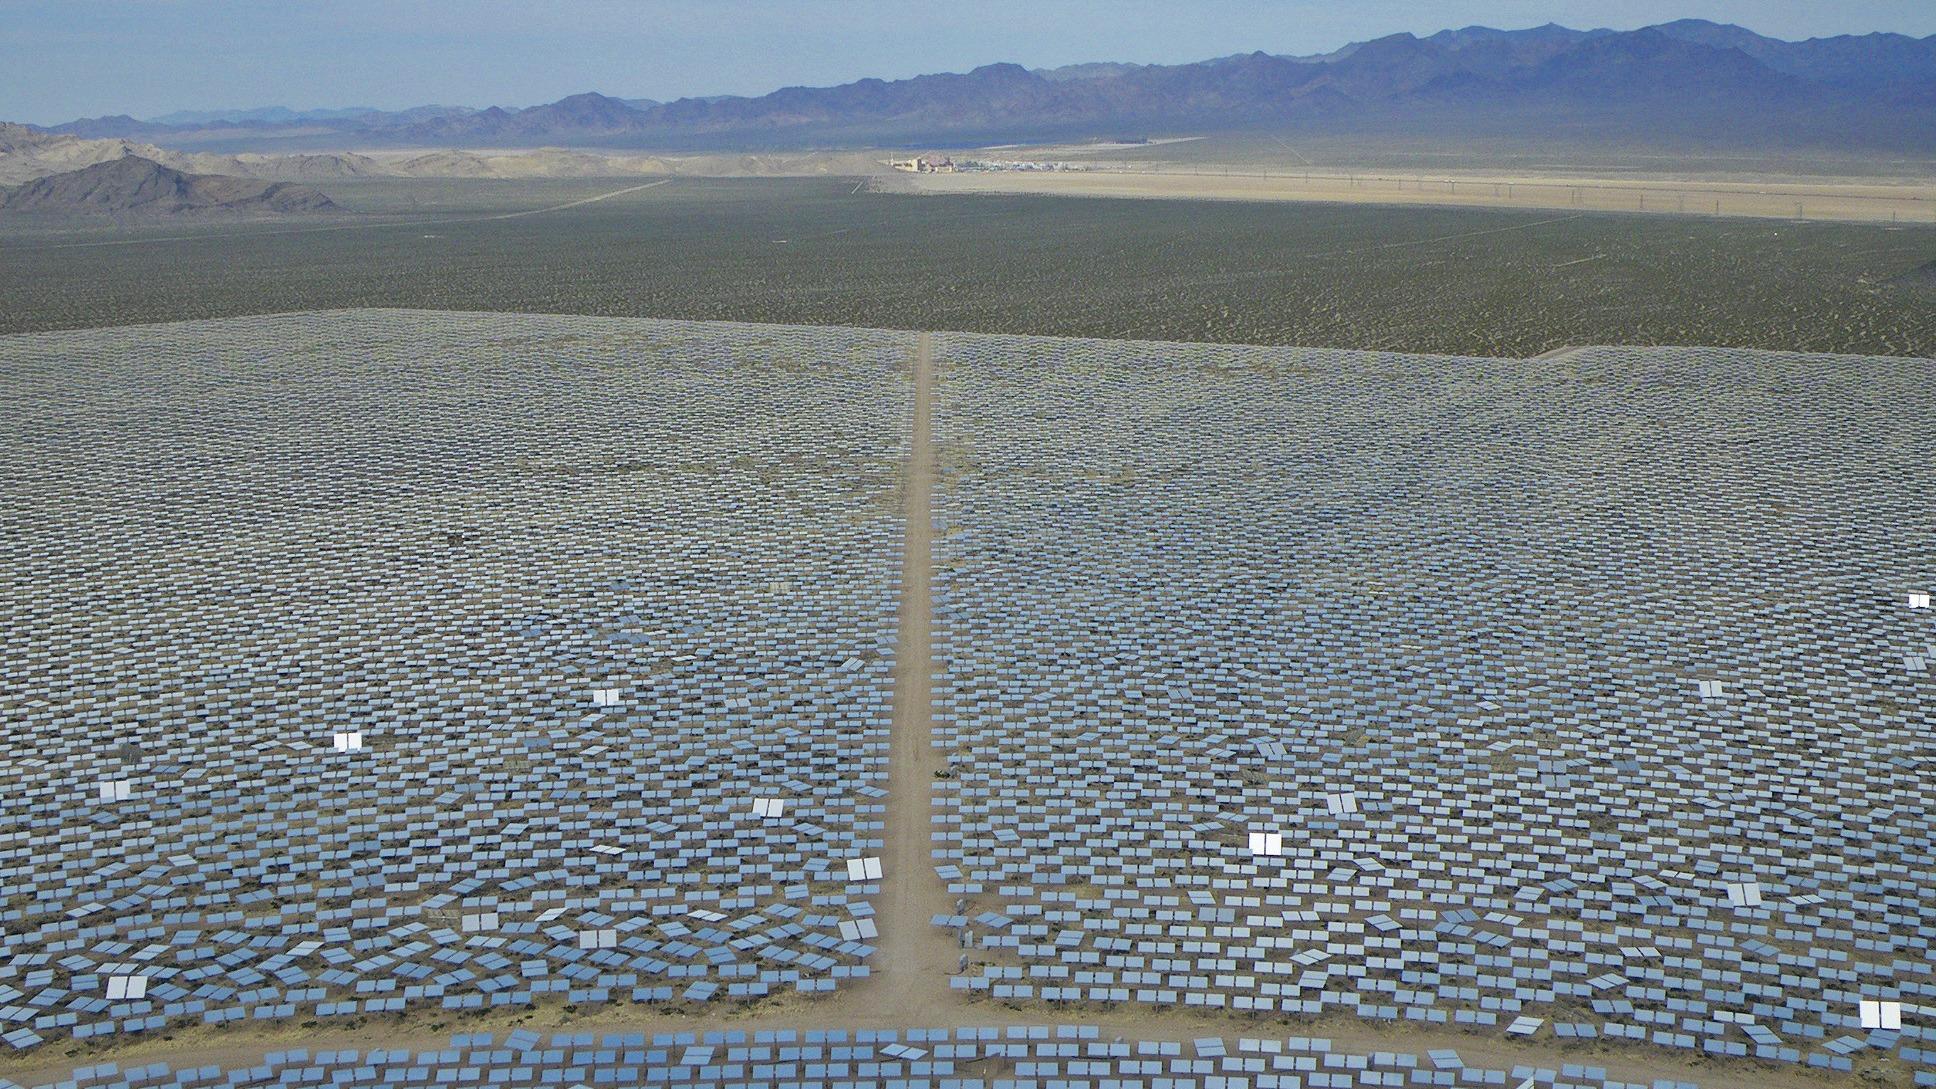 Ivanpah solar facility in Mojave Desert